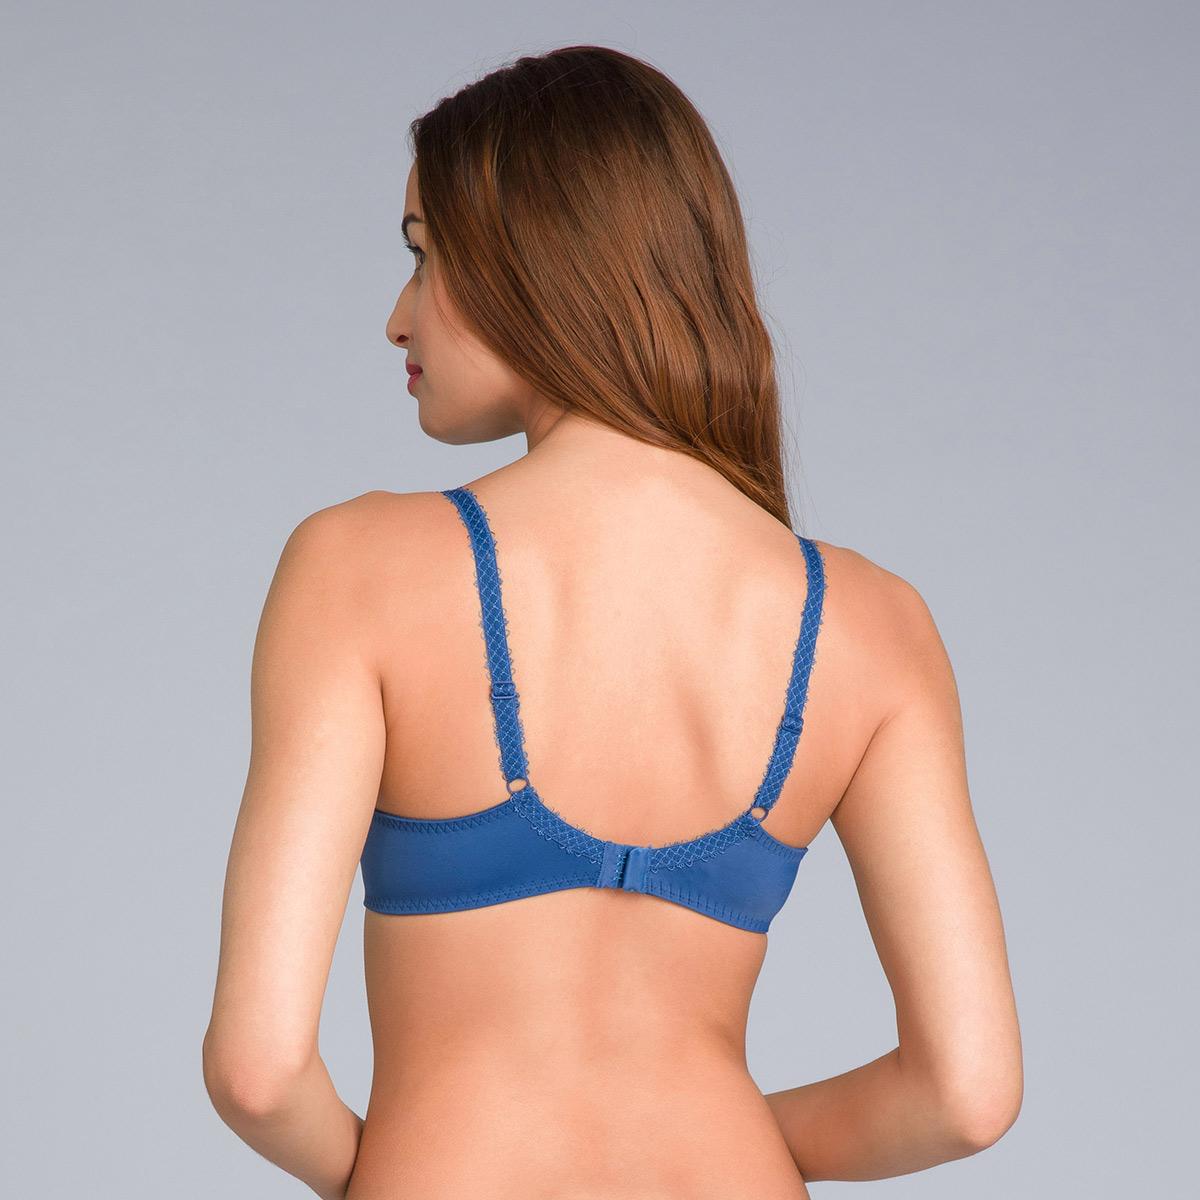 Soutien-gorge emboîtant bleu marine imprimé - Flower Elegance Micro, , PLAYTEX